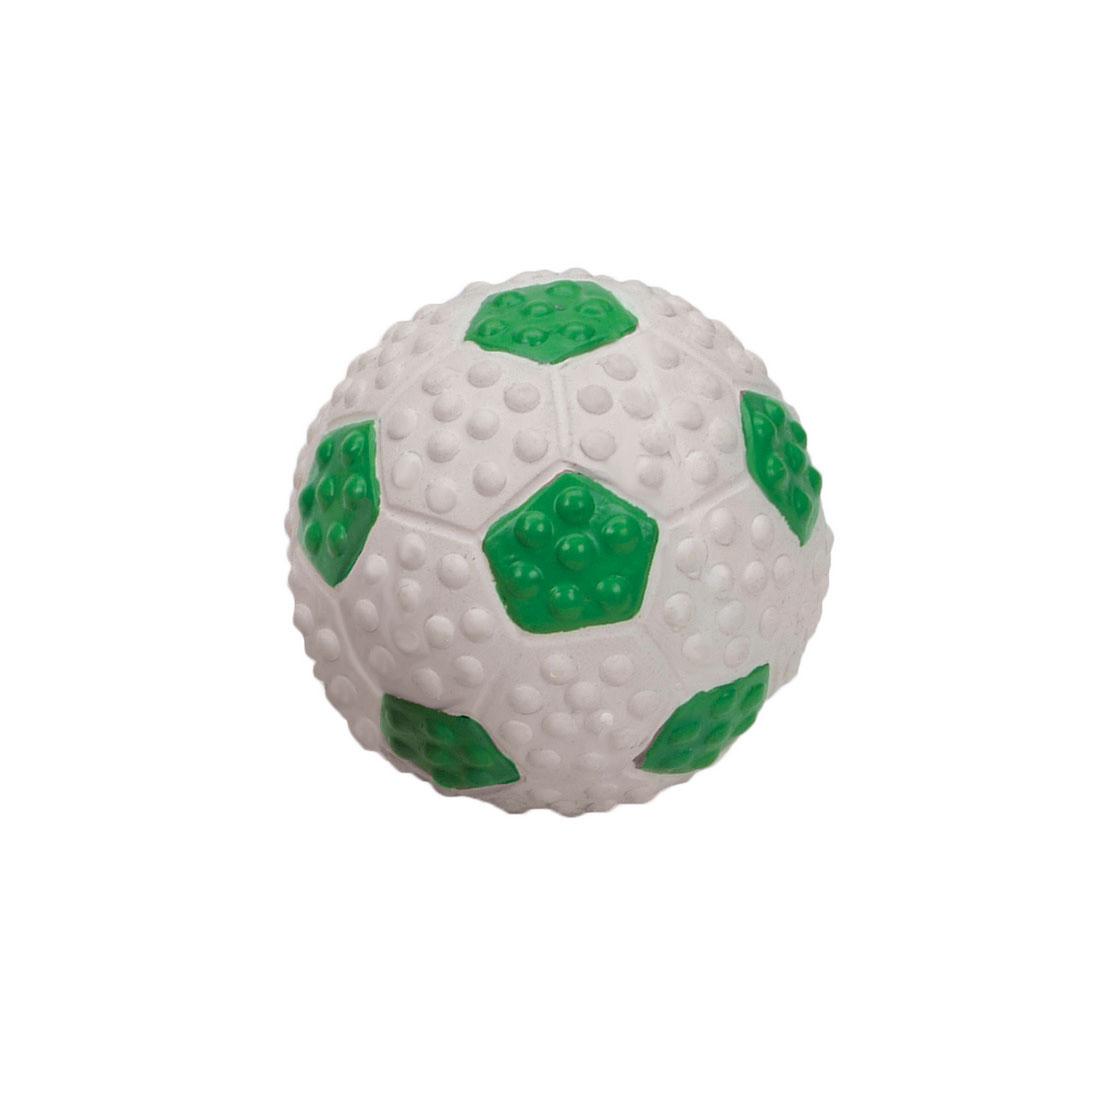 Coastal Pet Li'l Pals Latex Soccer Ball Dog Toy, Green & White